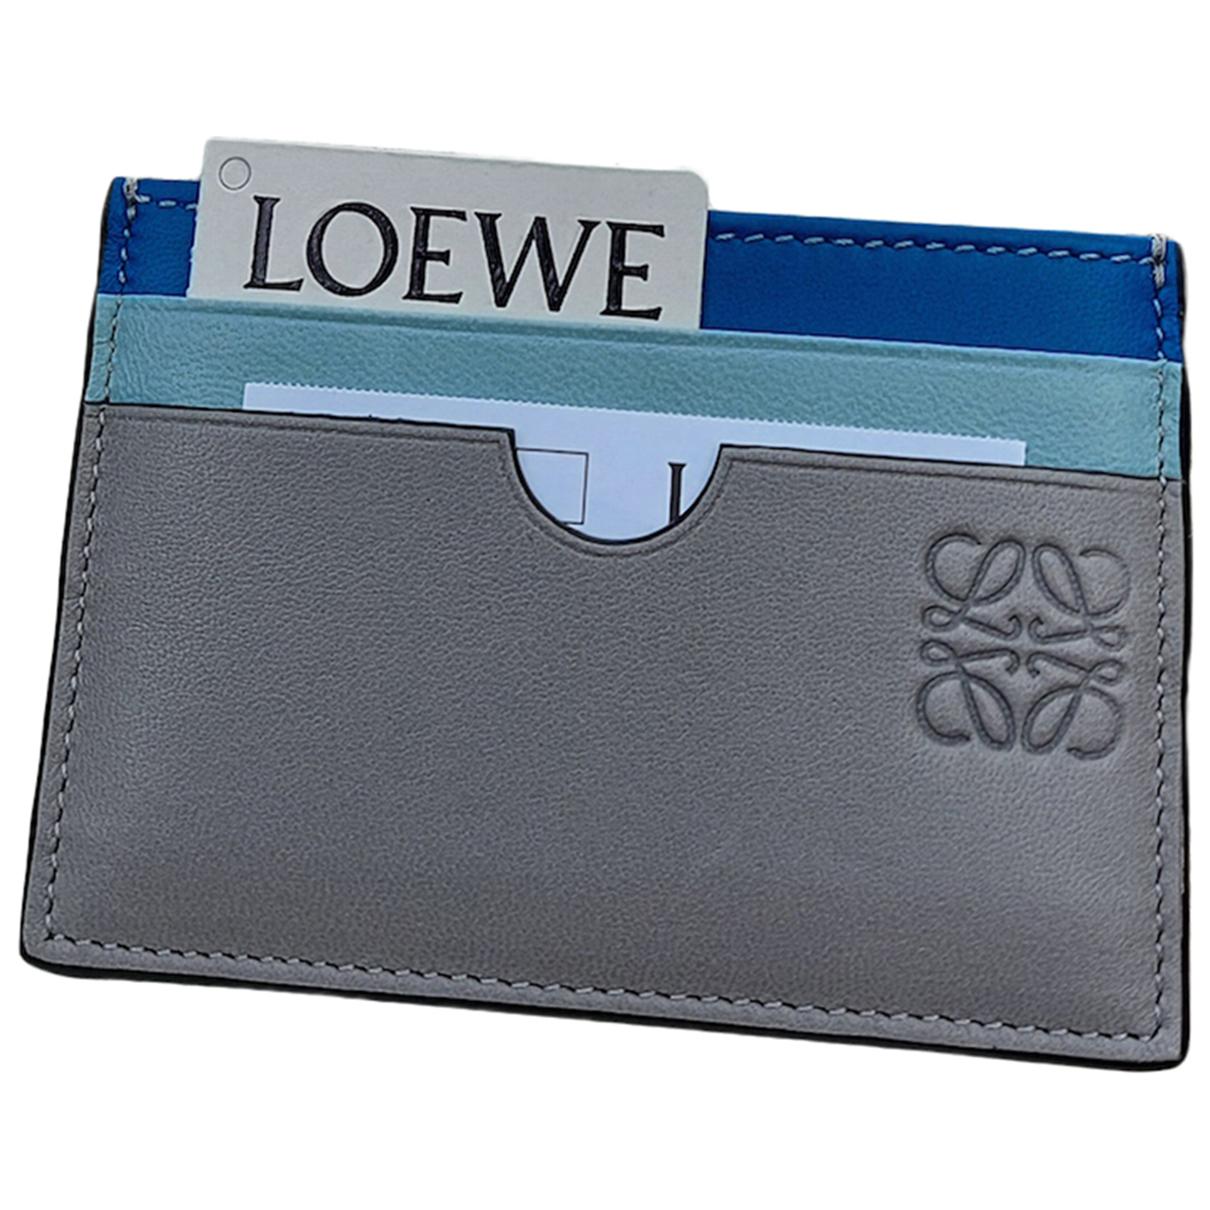 Marroquineria de Cuero Loewe